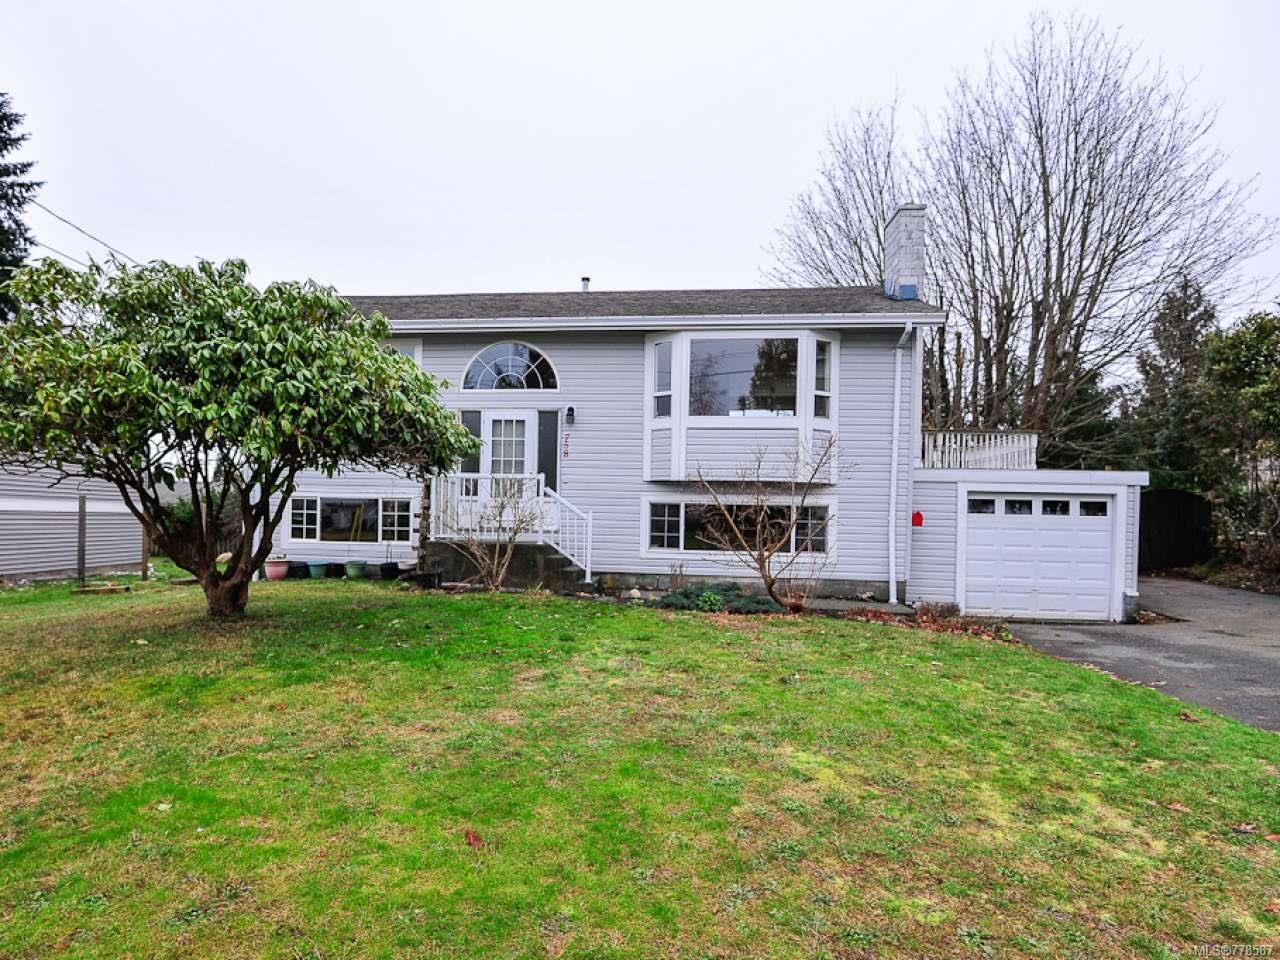 Main Photo: 758 MARINA Boulevard in CAMPBELL RIVER: CR Campbell River Central House for sale (Campbell River)  : MLS®# 778587